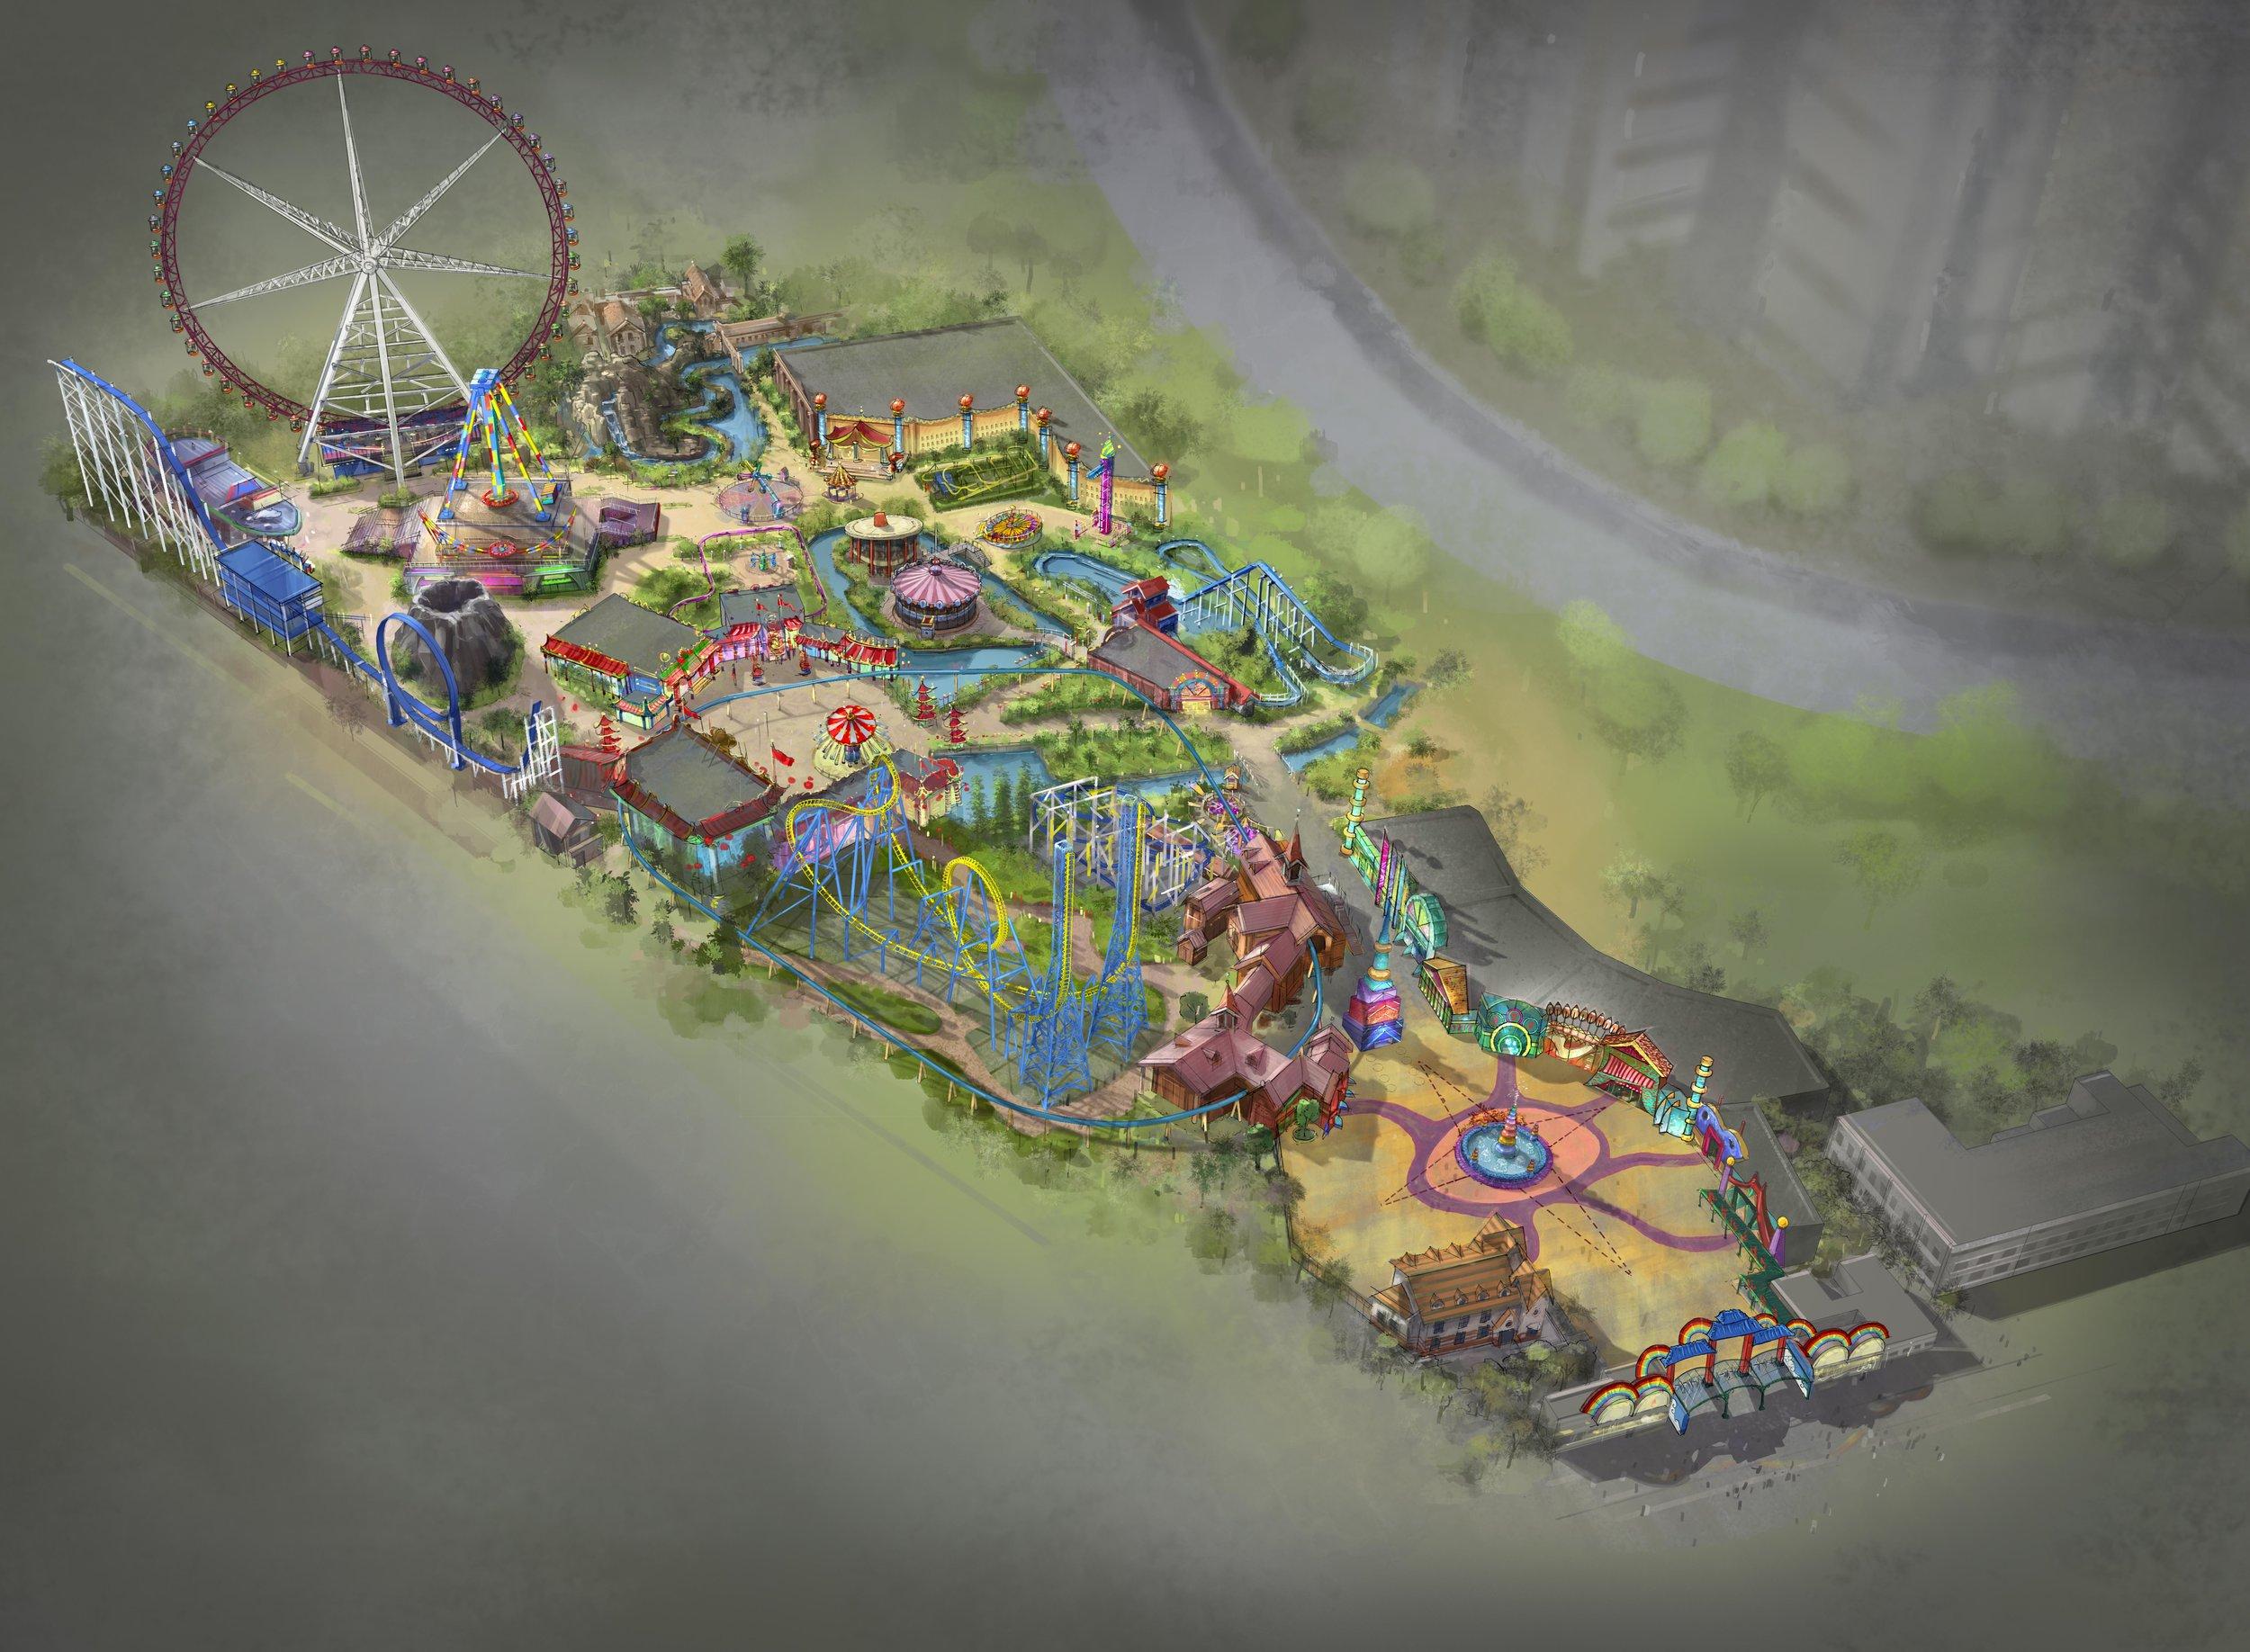 JINJIANG THEME PARK <strong>| Redesign of Jinjiang Theme Park</strong>